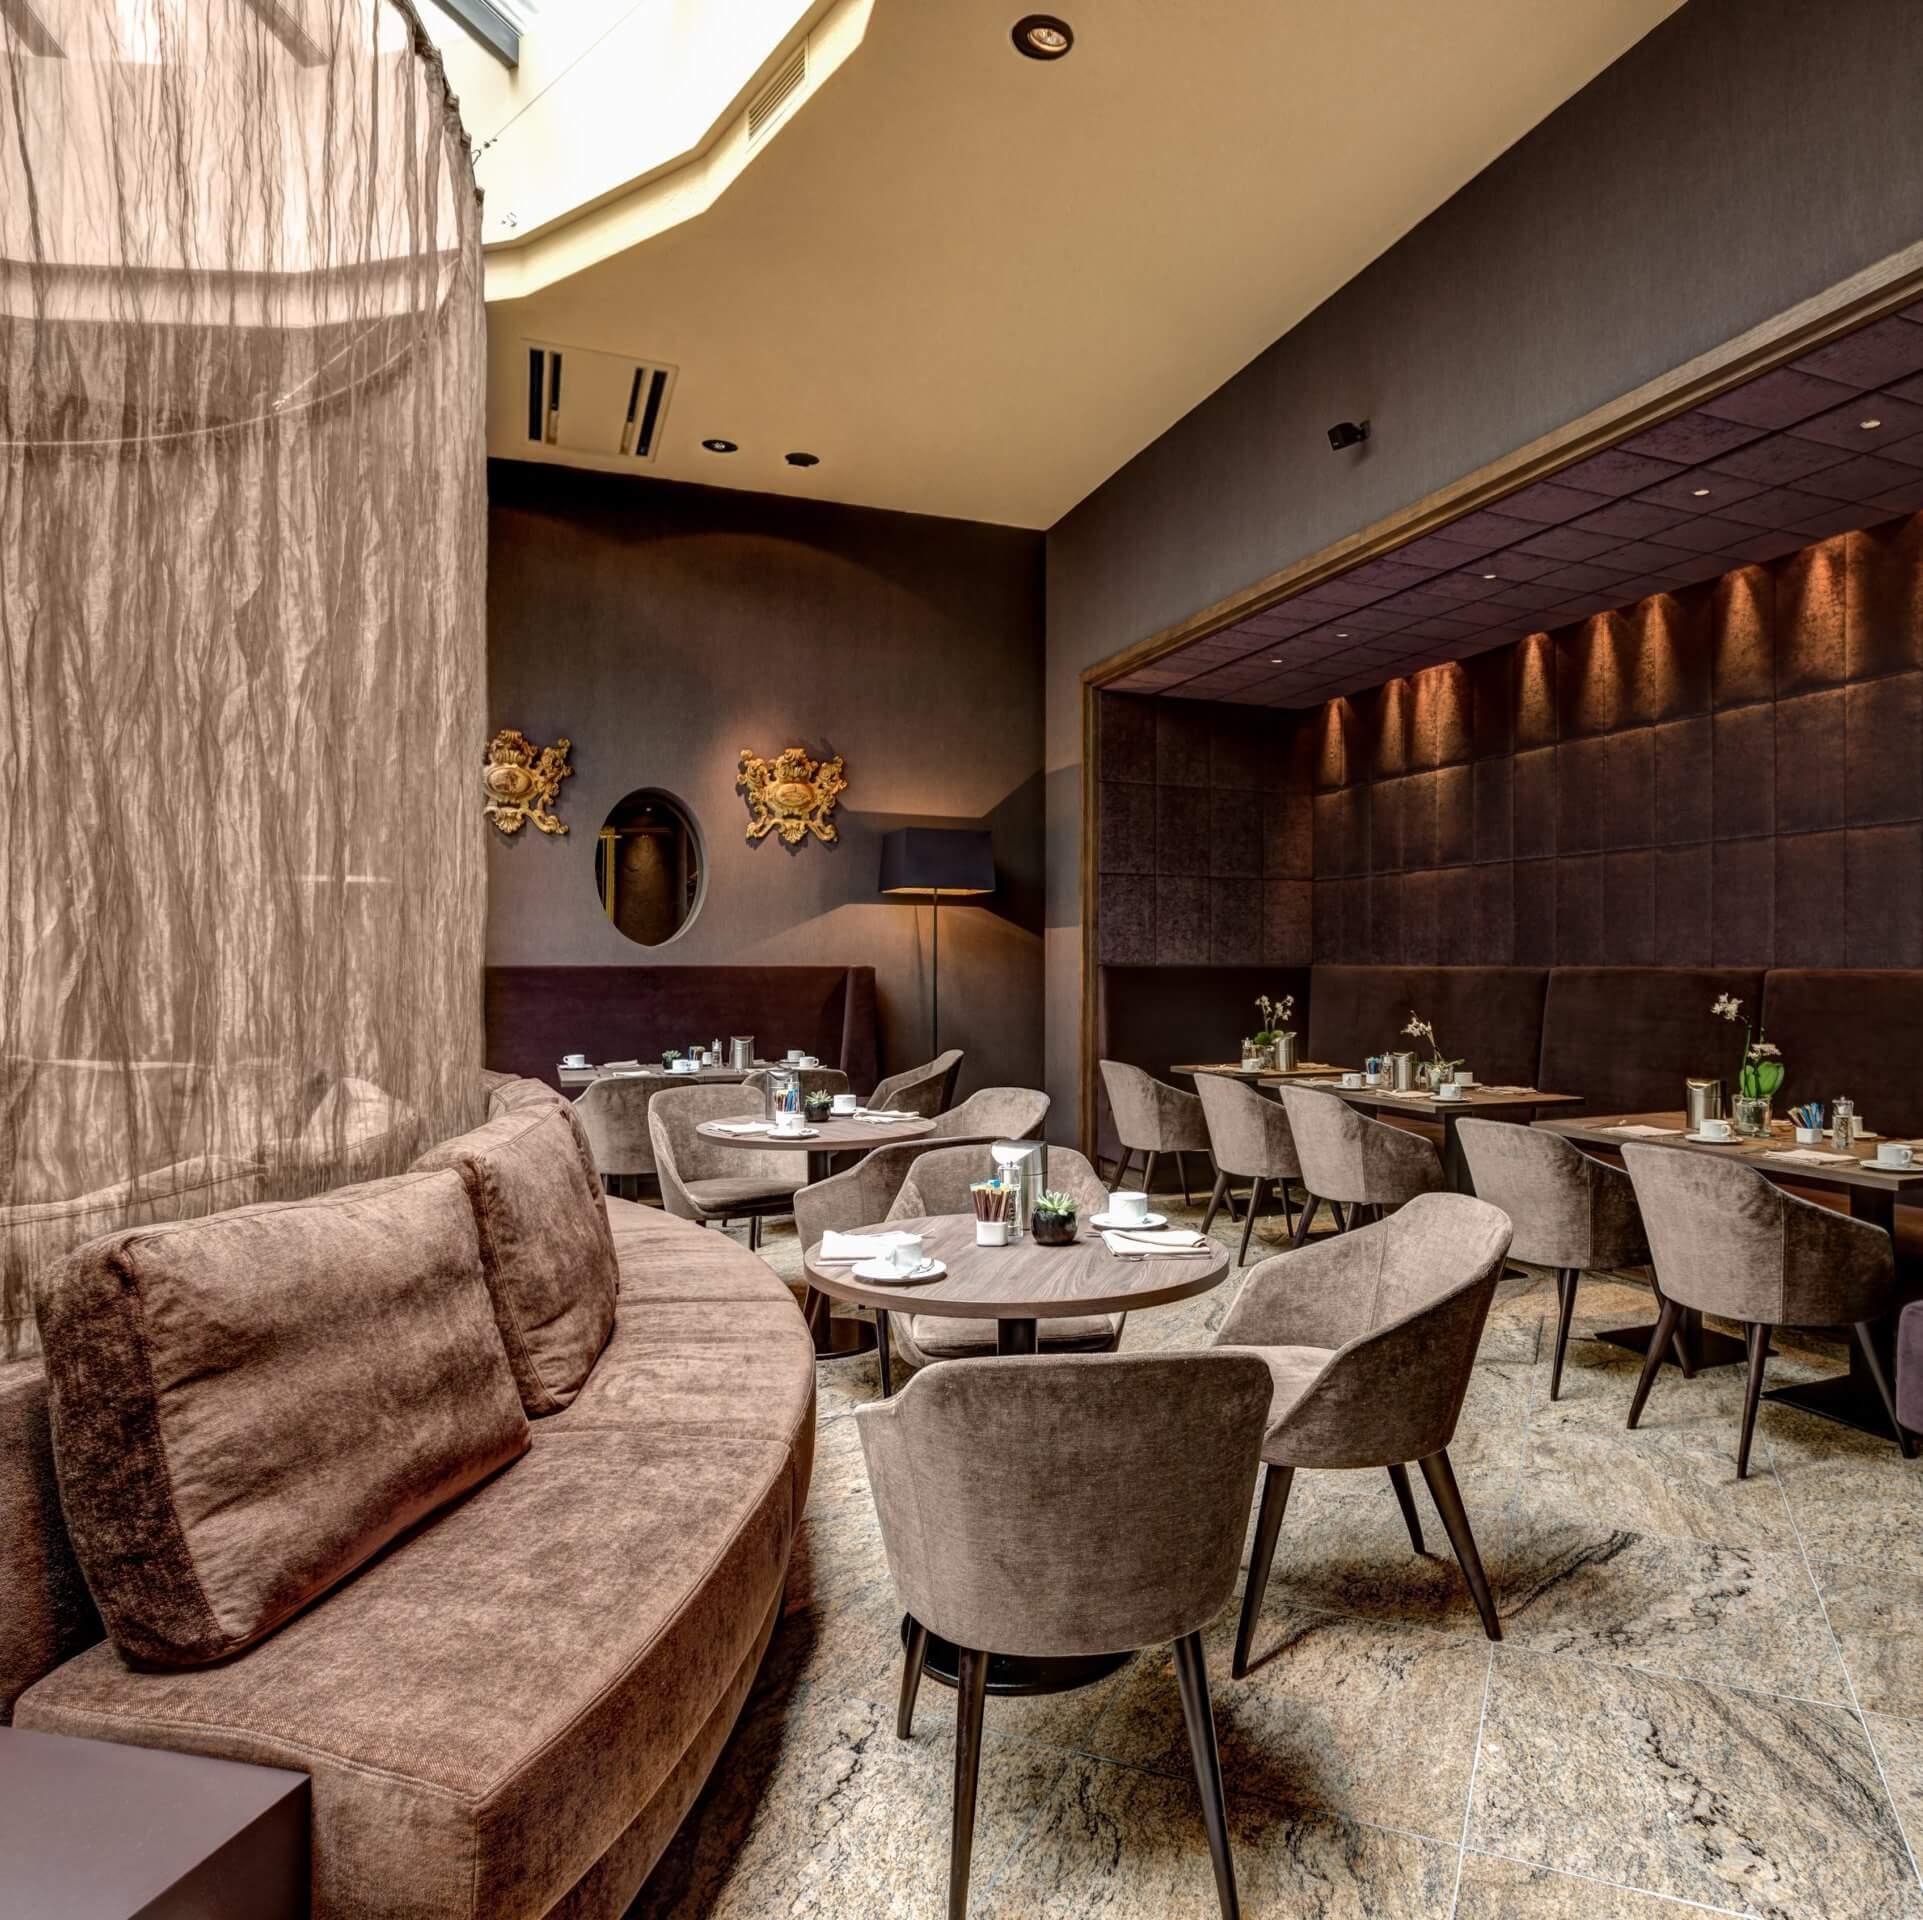 Best Western Premier Hotel Rebstock Restaurant